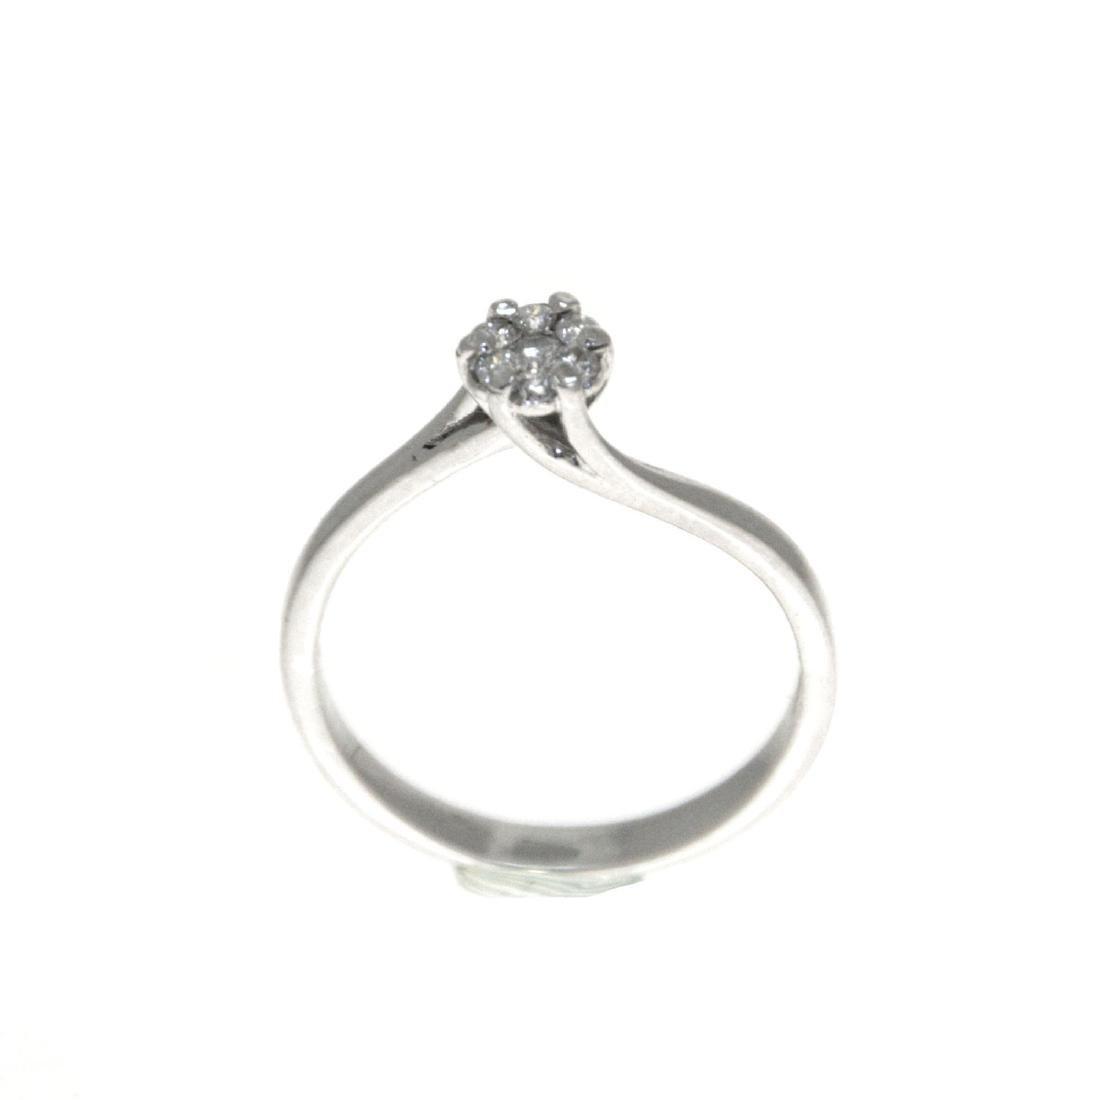 14k White Gold Diamond Ring.